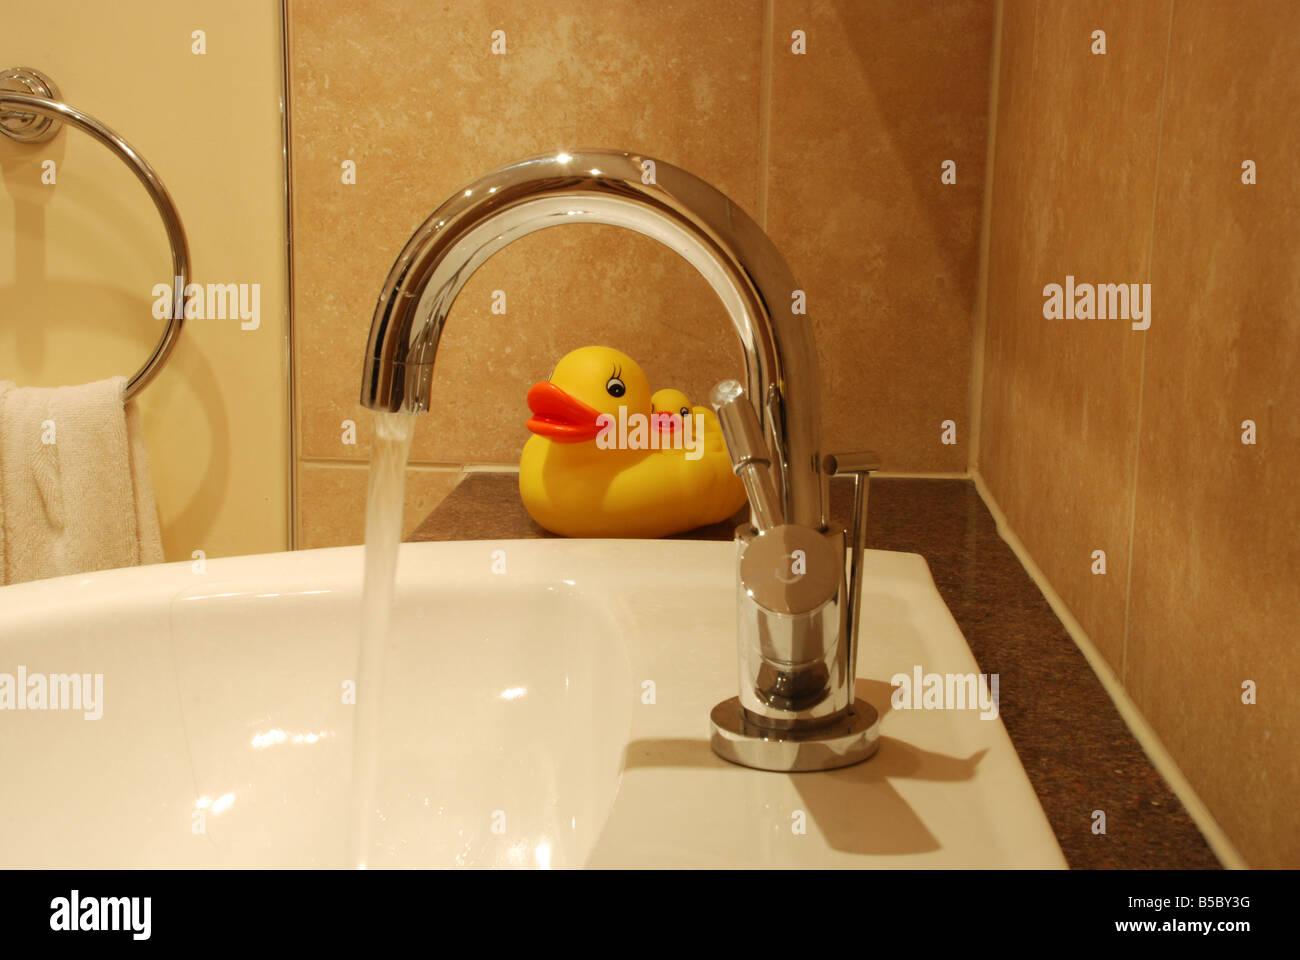 Bathroom Ducks Stock Photos & Bathroom Ducks Stock Images - Alamy